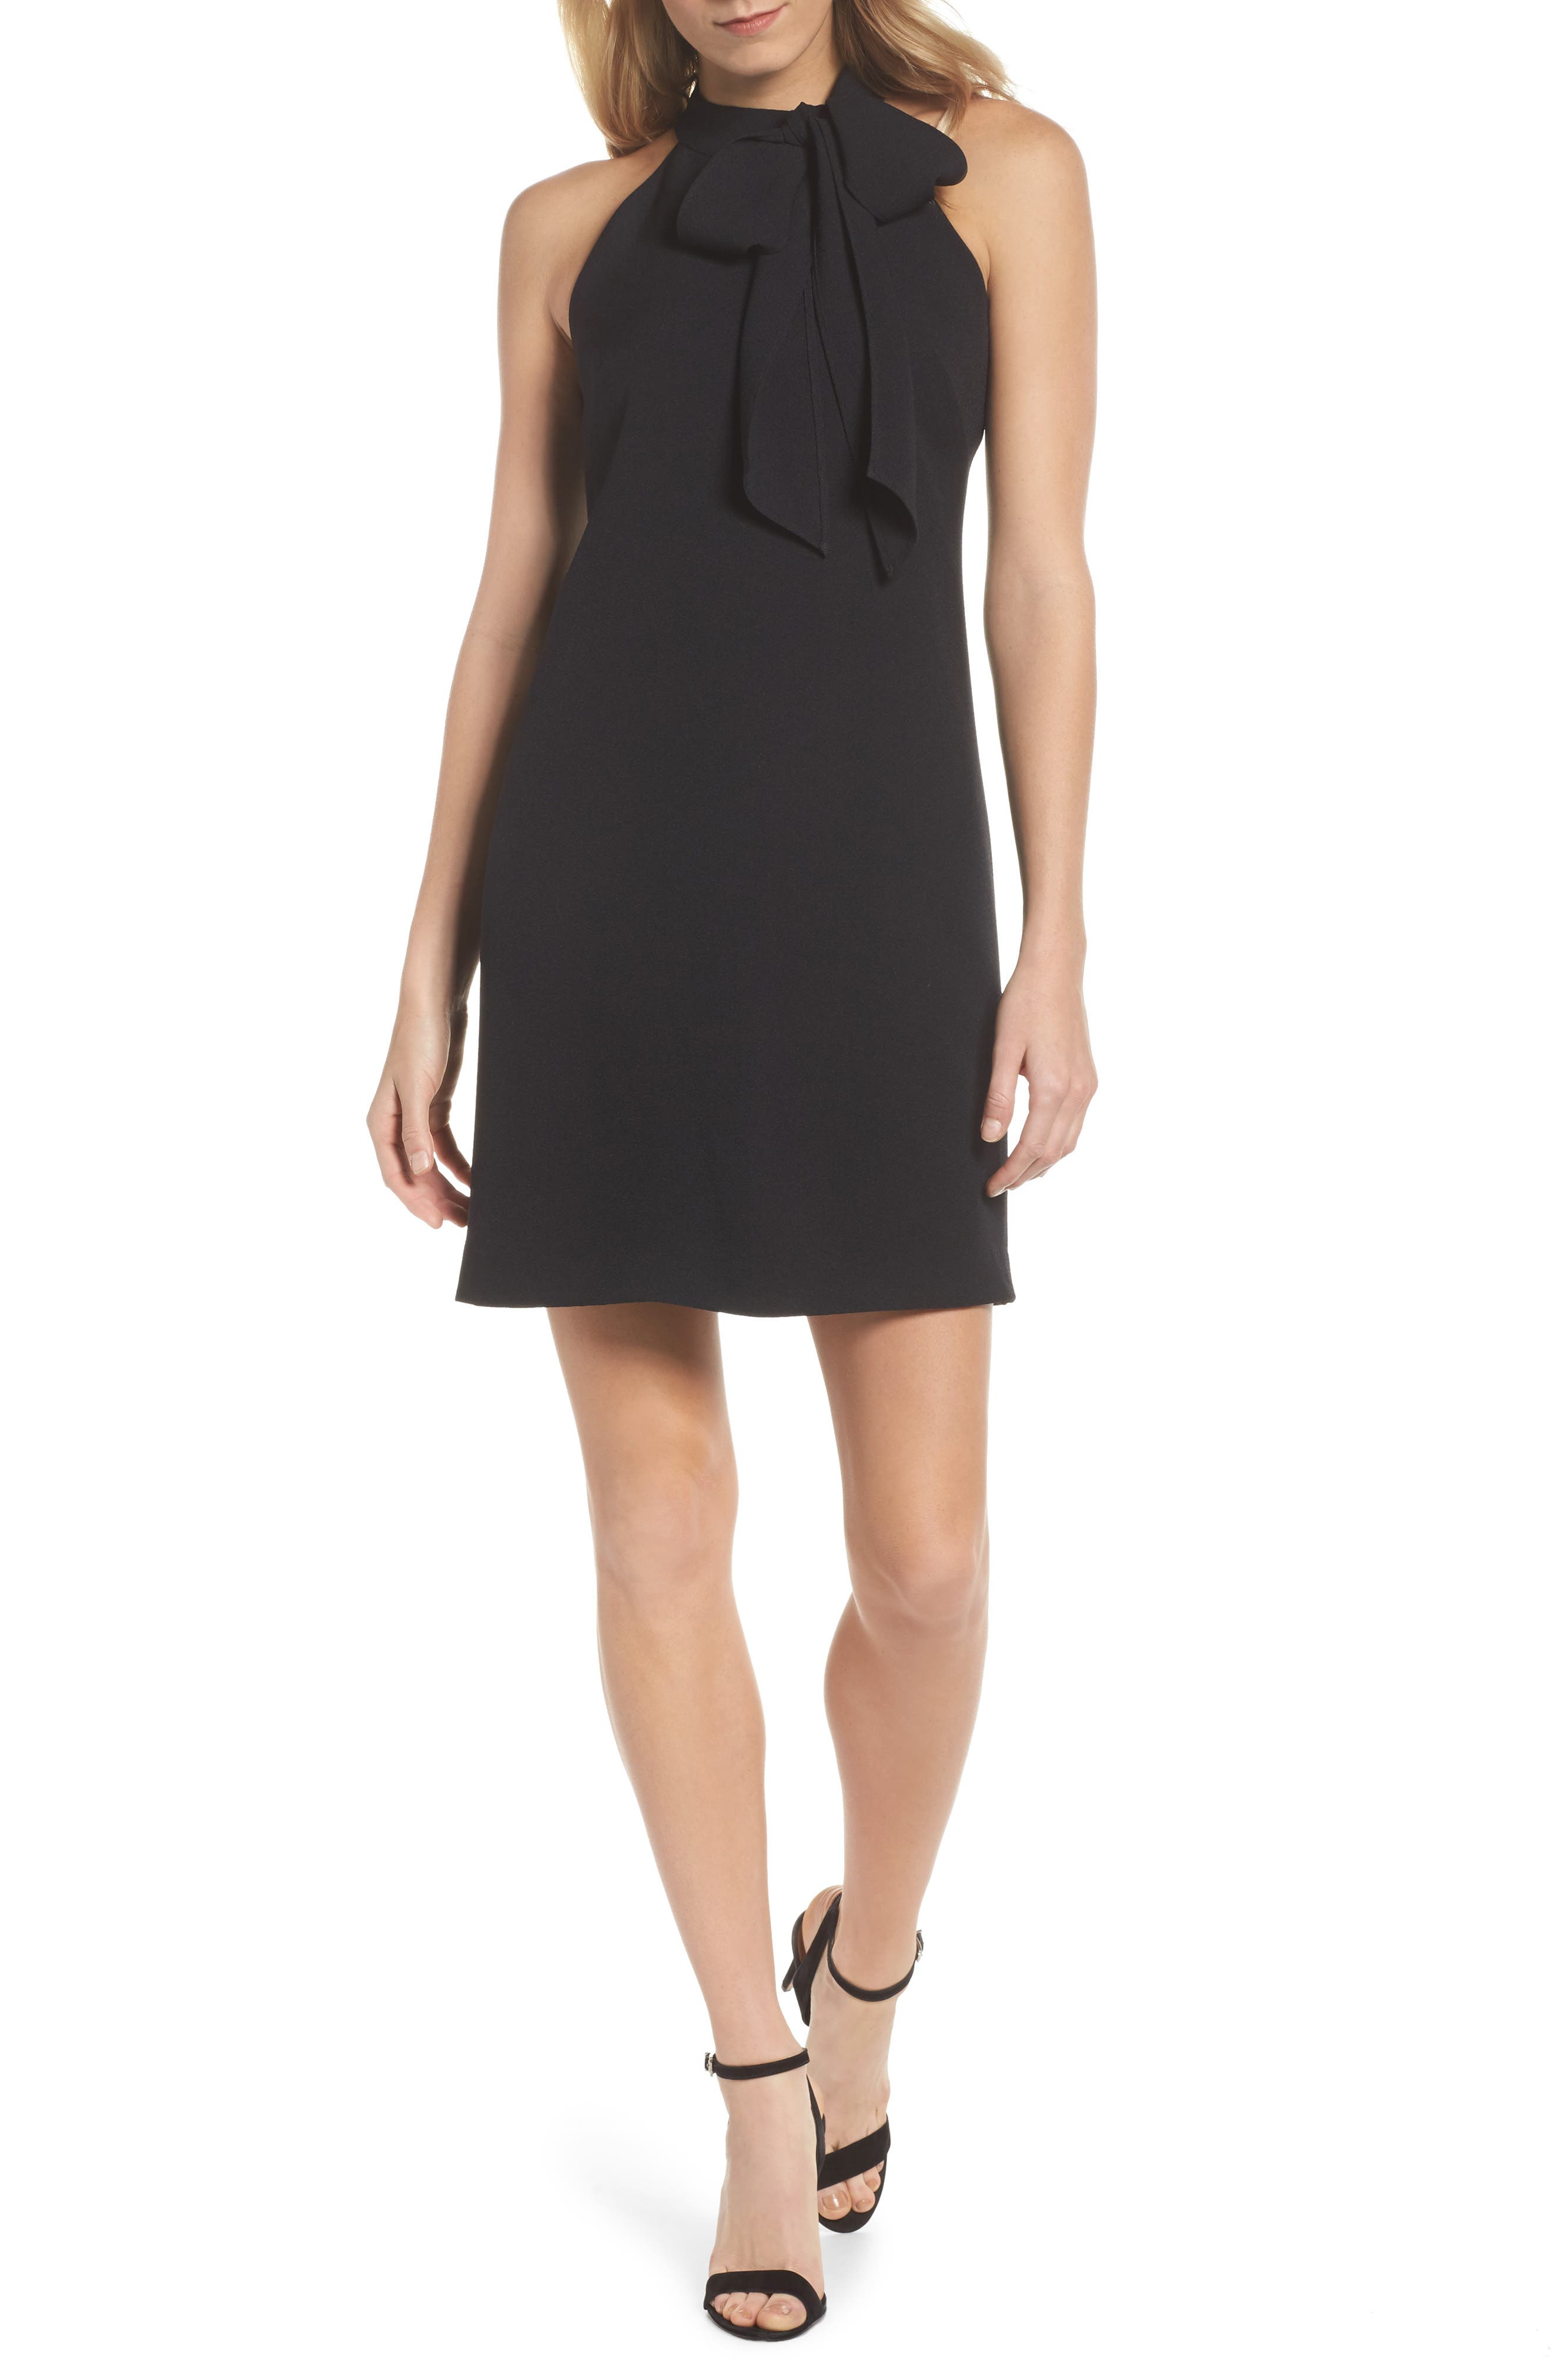 VINCE CAMUTO Halter Tie Neck A-Line Dress, Main, color, 001